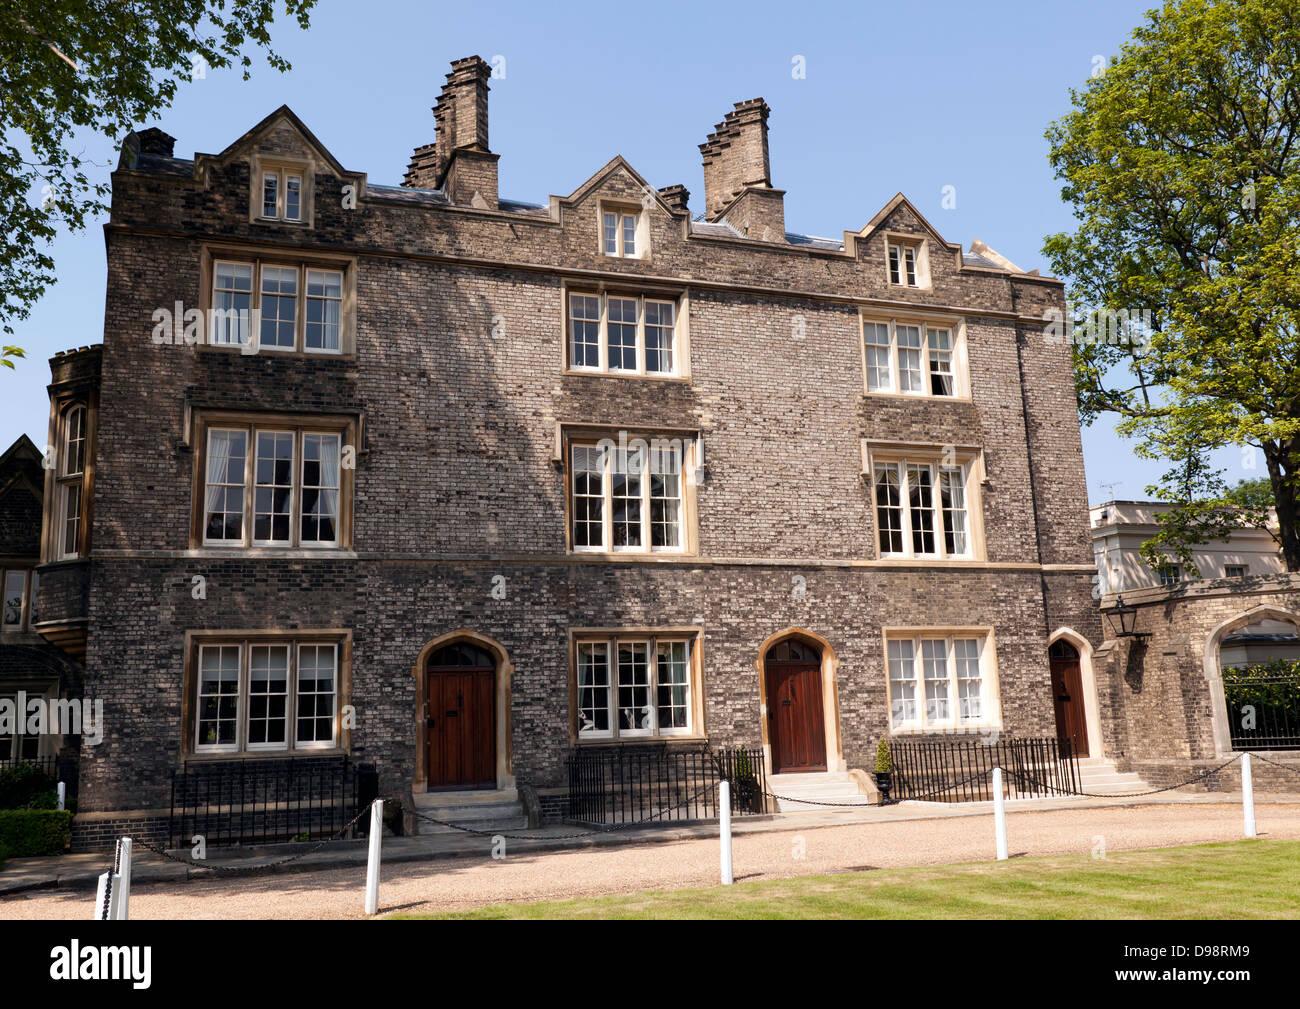 St Katherines Hall,  4 Saint Katharine's Precinct, Regent's Park, London NW1 4HH - Stock Image